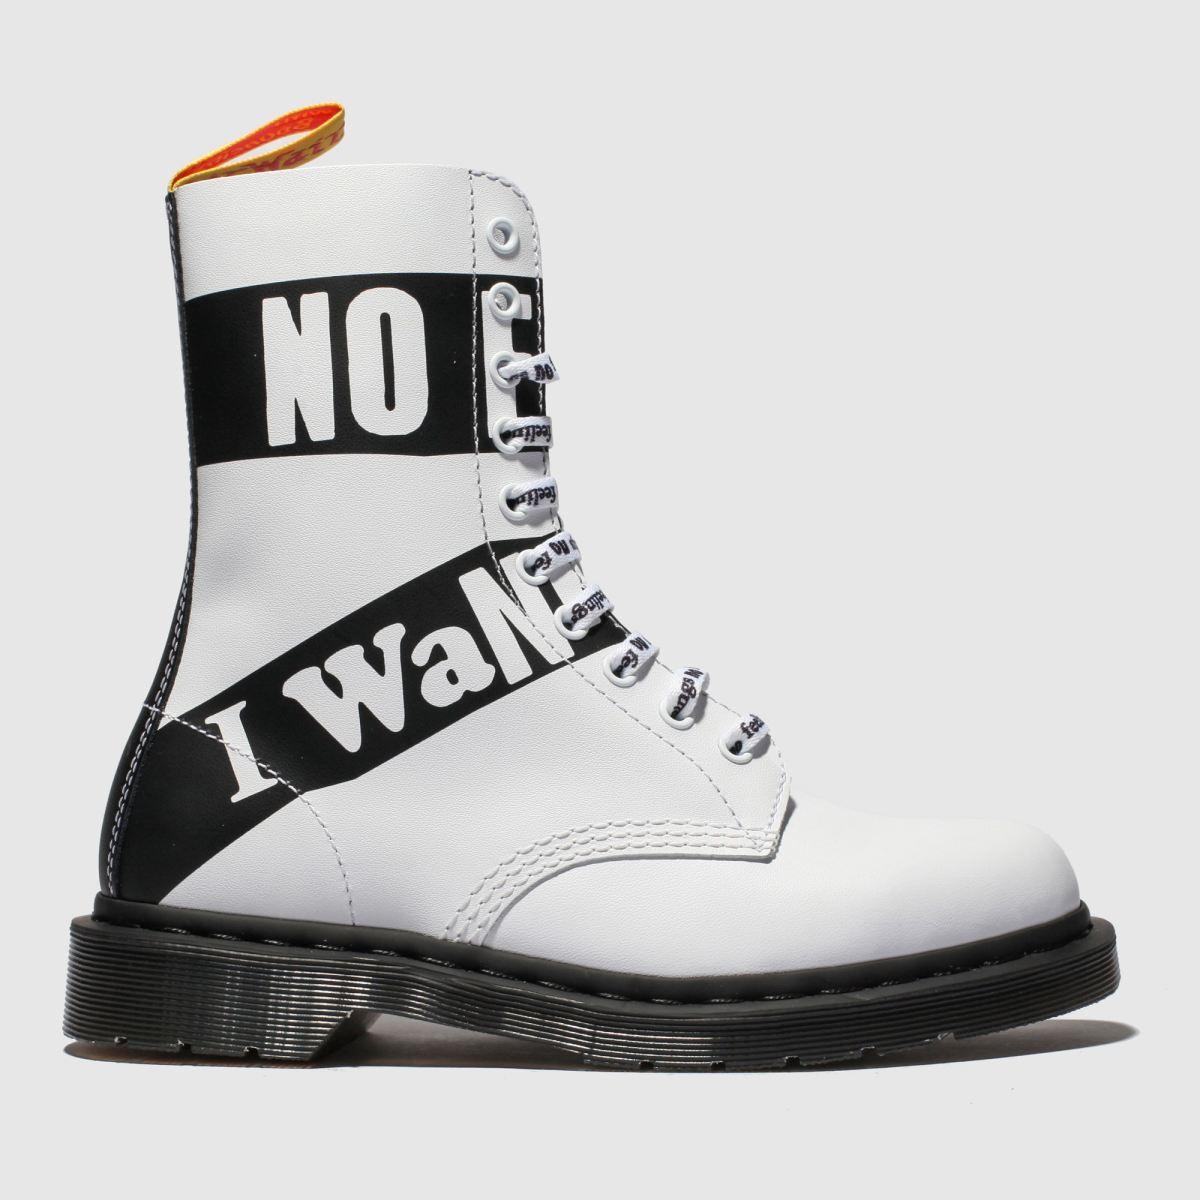 Dr Martens White & Black 1490 10 Eye X Sex Pistols Boots